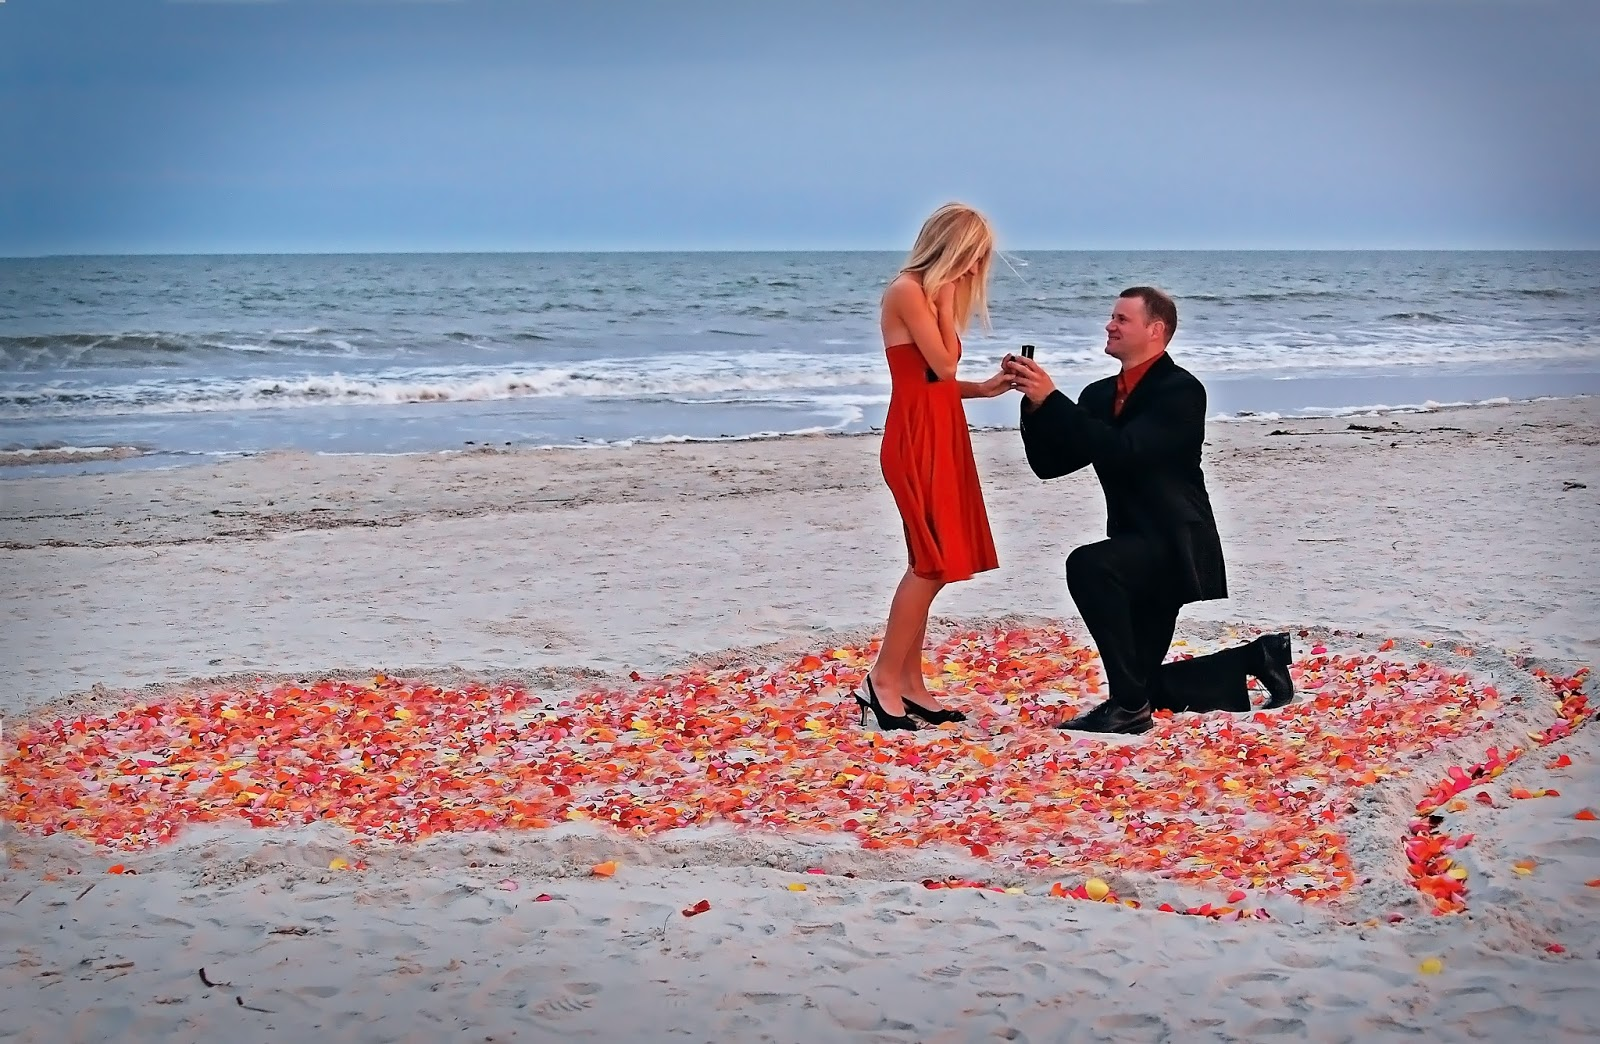 beach moments heart love - photo #13